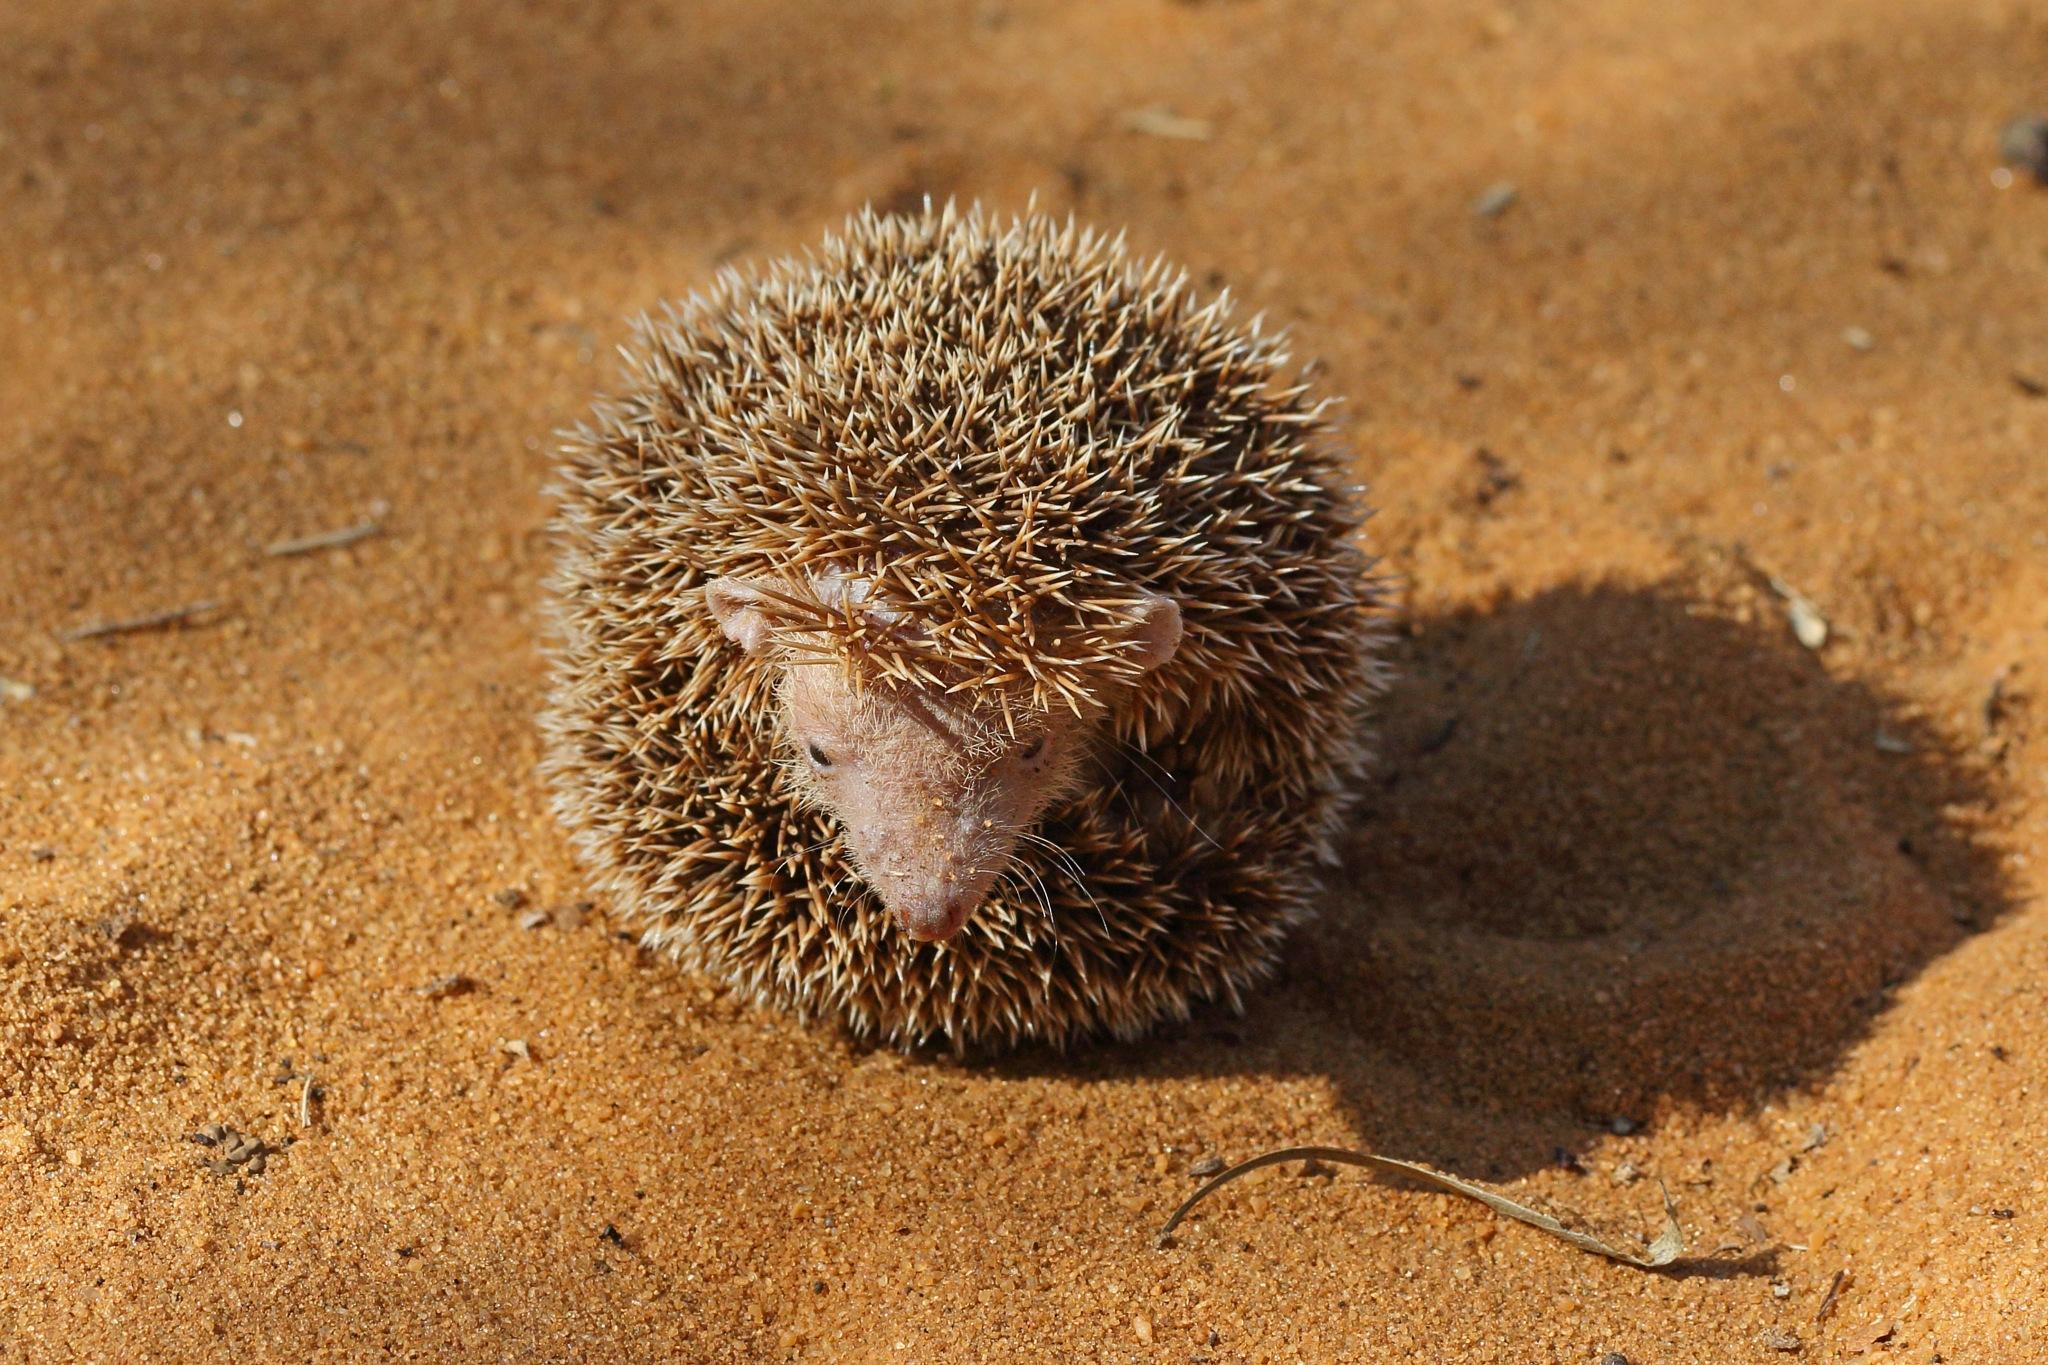 Lesser Hedgehog Tenrec by Nigel Voaden